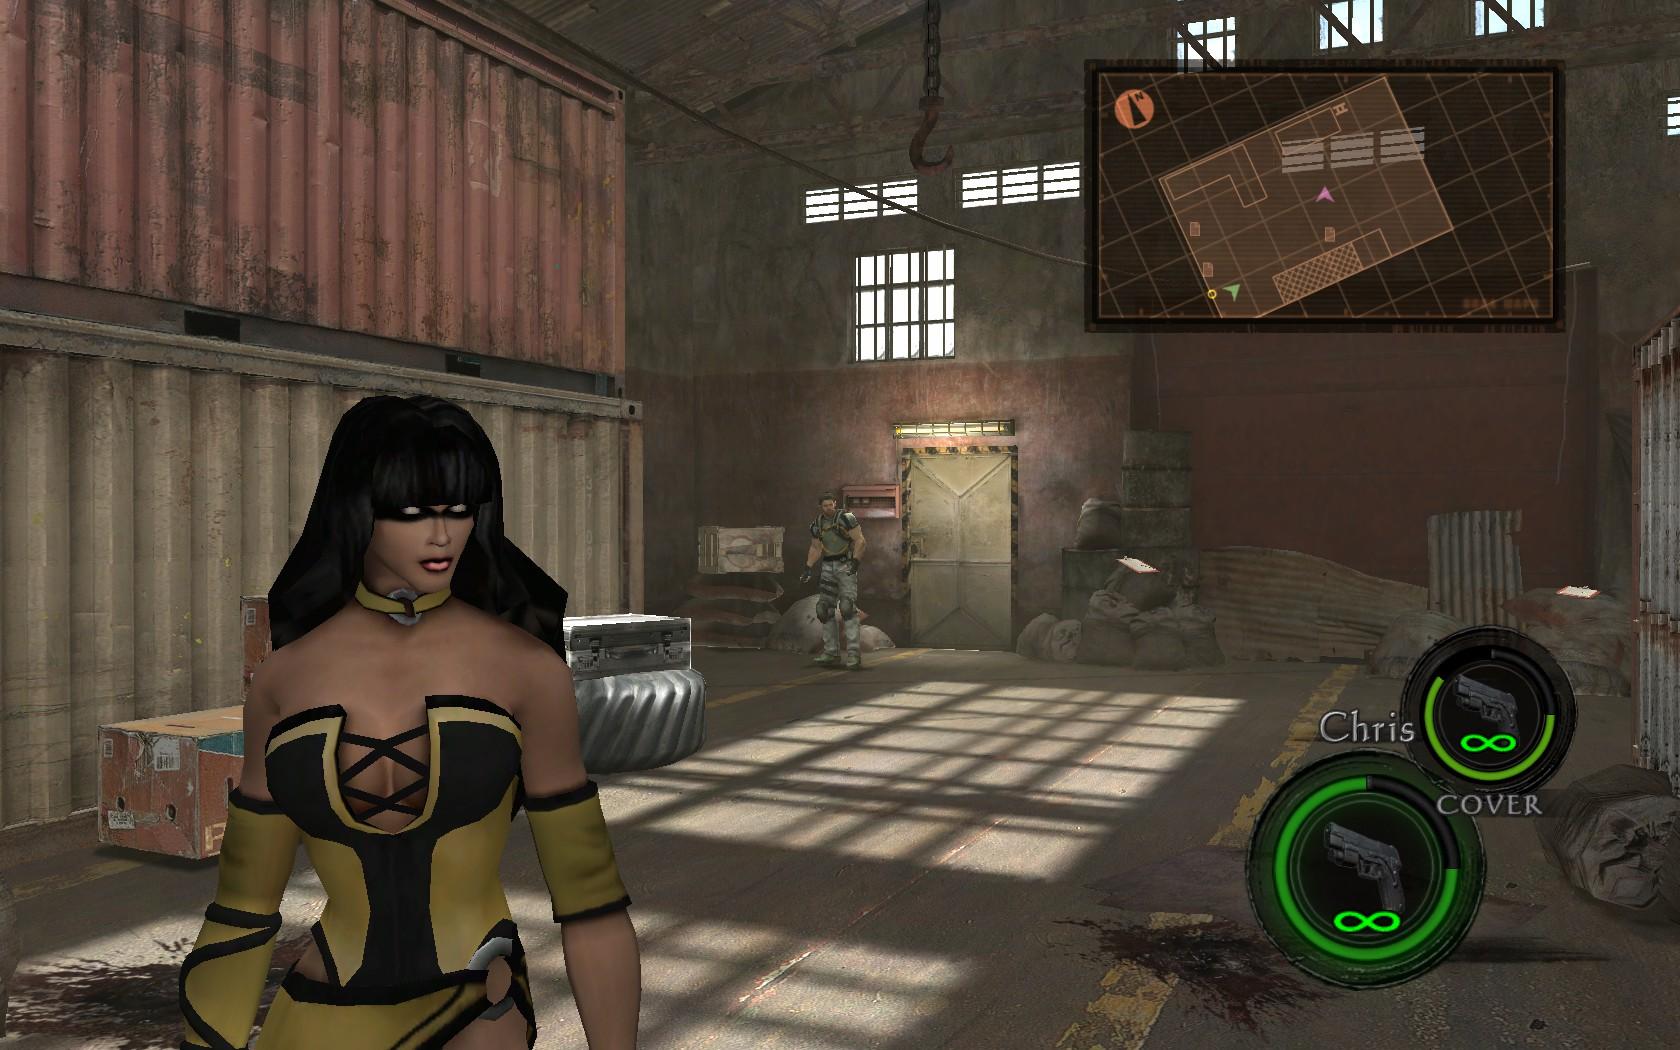 Mortal Kombat Girls 0_11f042_e1480a18_orig